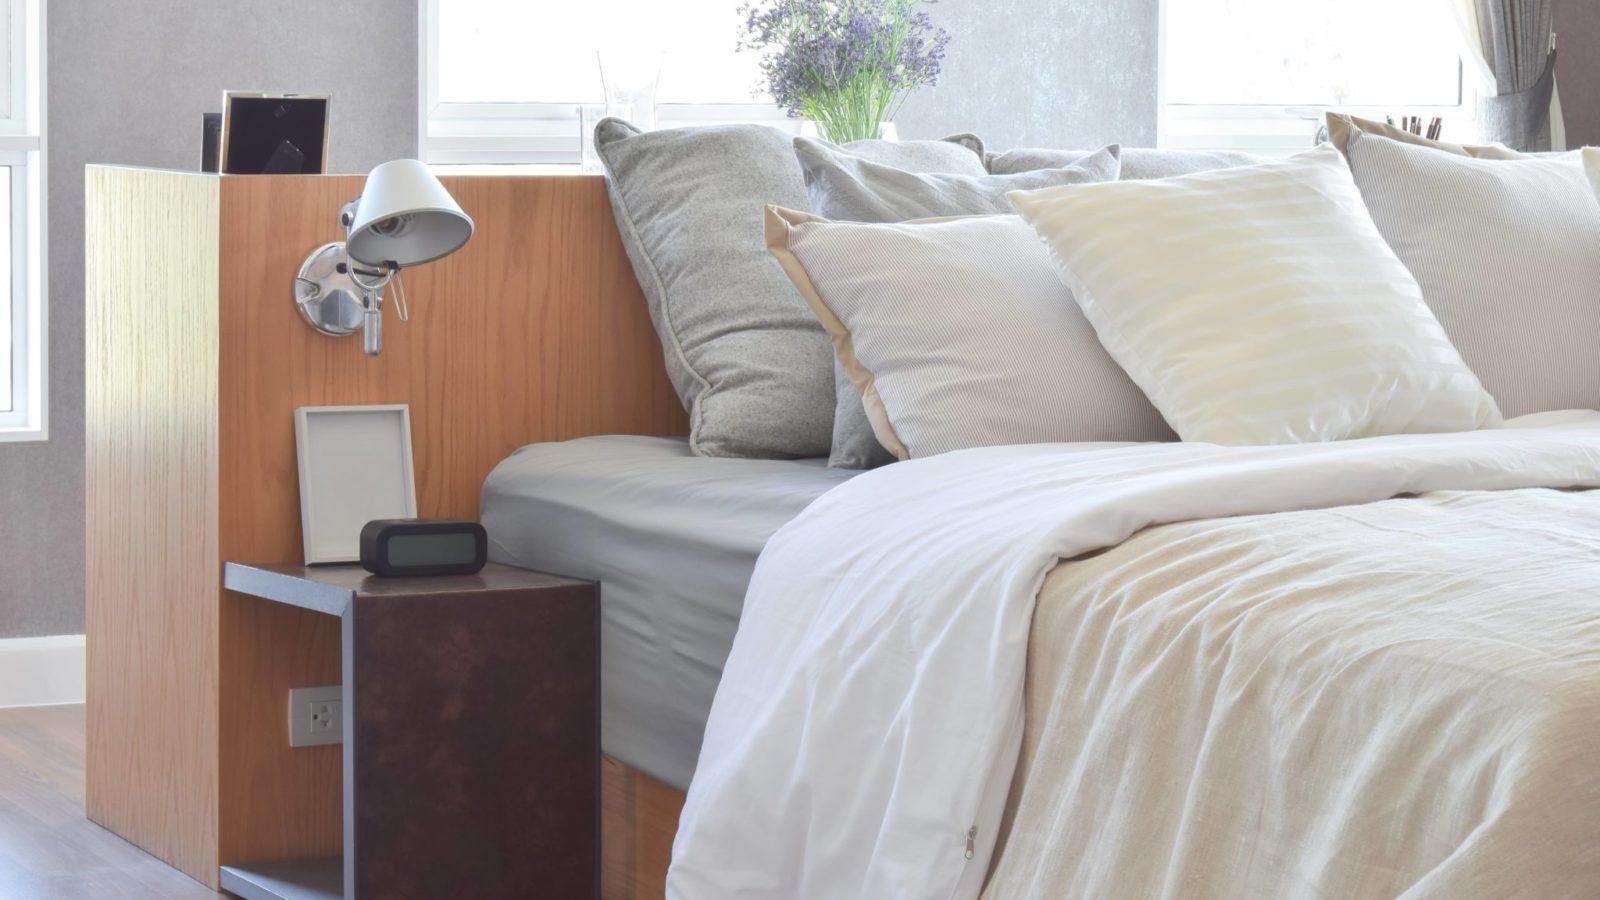 high-quality bedding